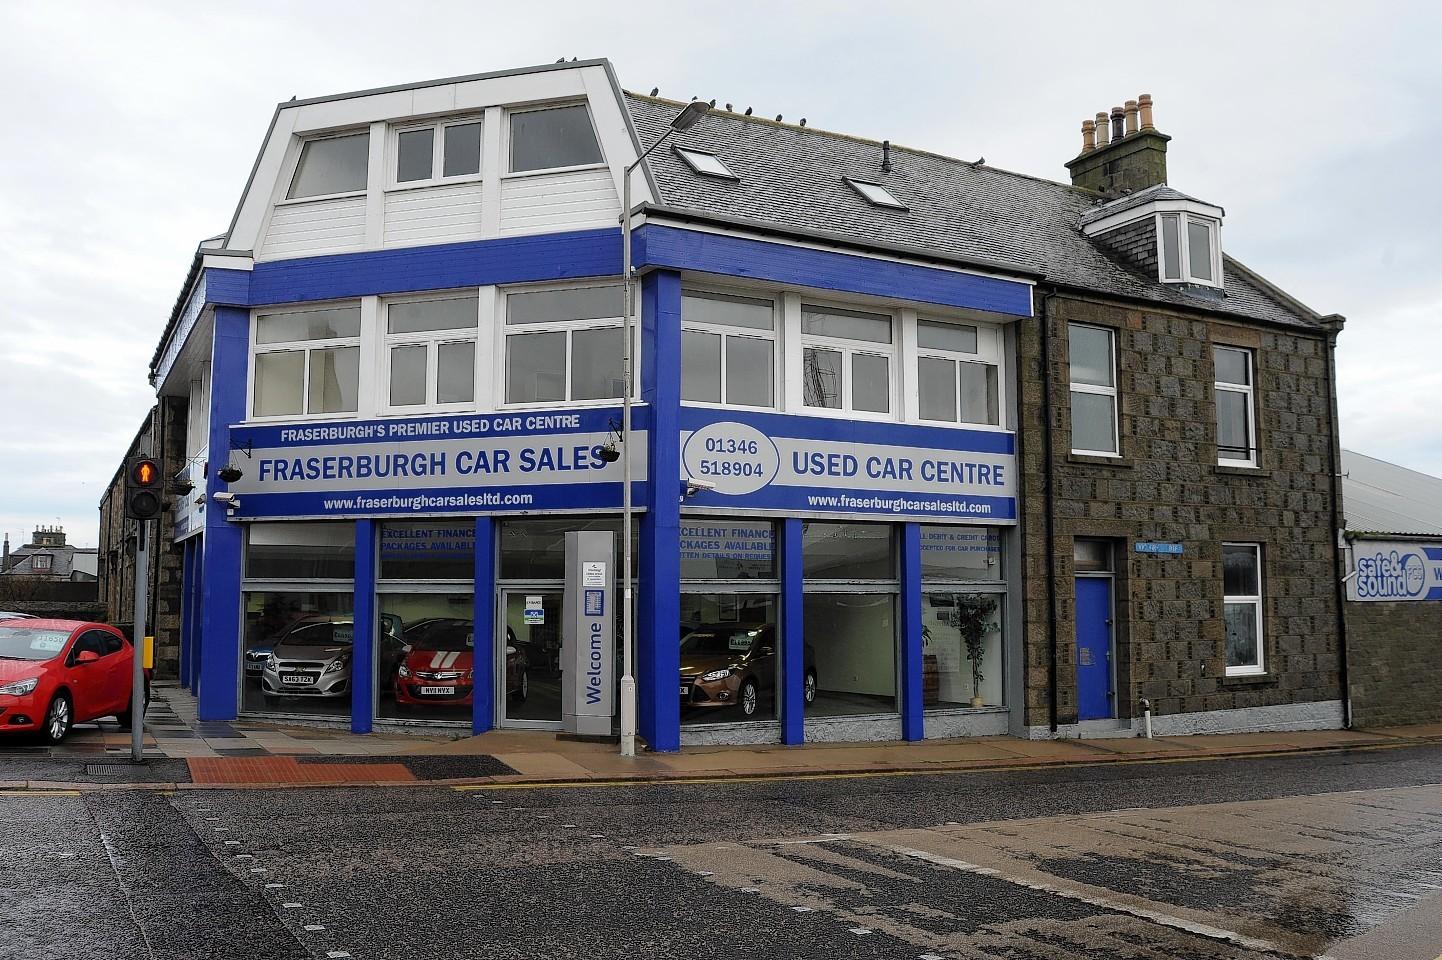 Fraserburgh Car Sales, Victoria Street